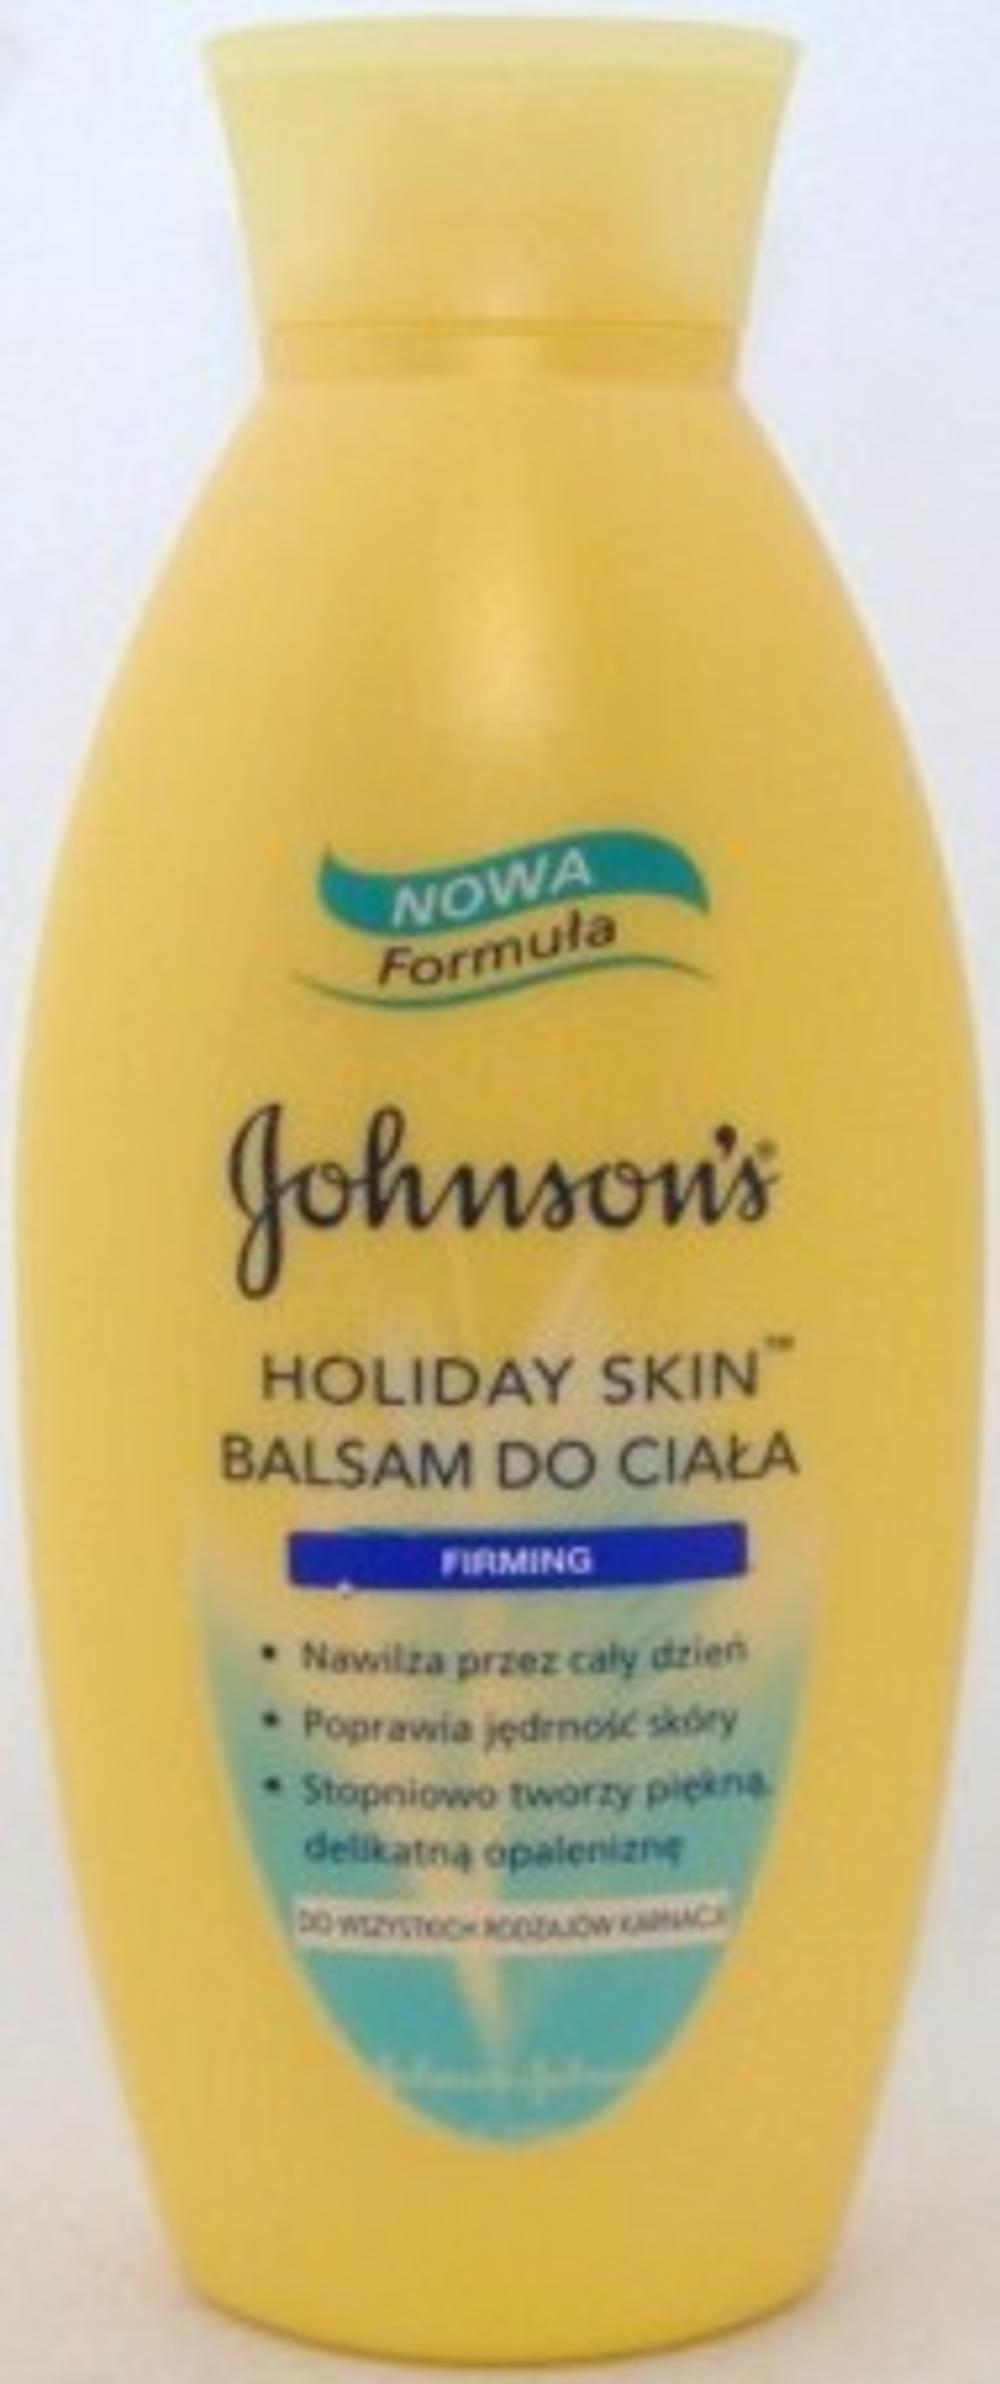 Johnson & Johnson holiday skin - Daily facial moisturiser